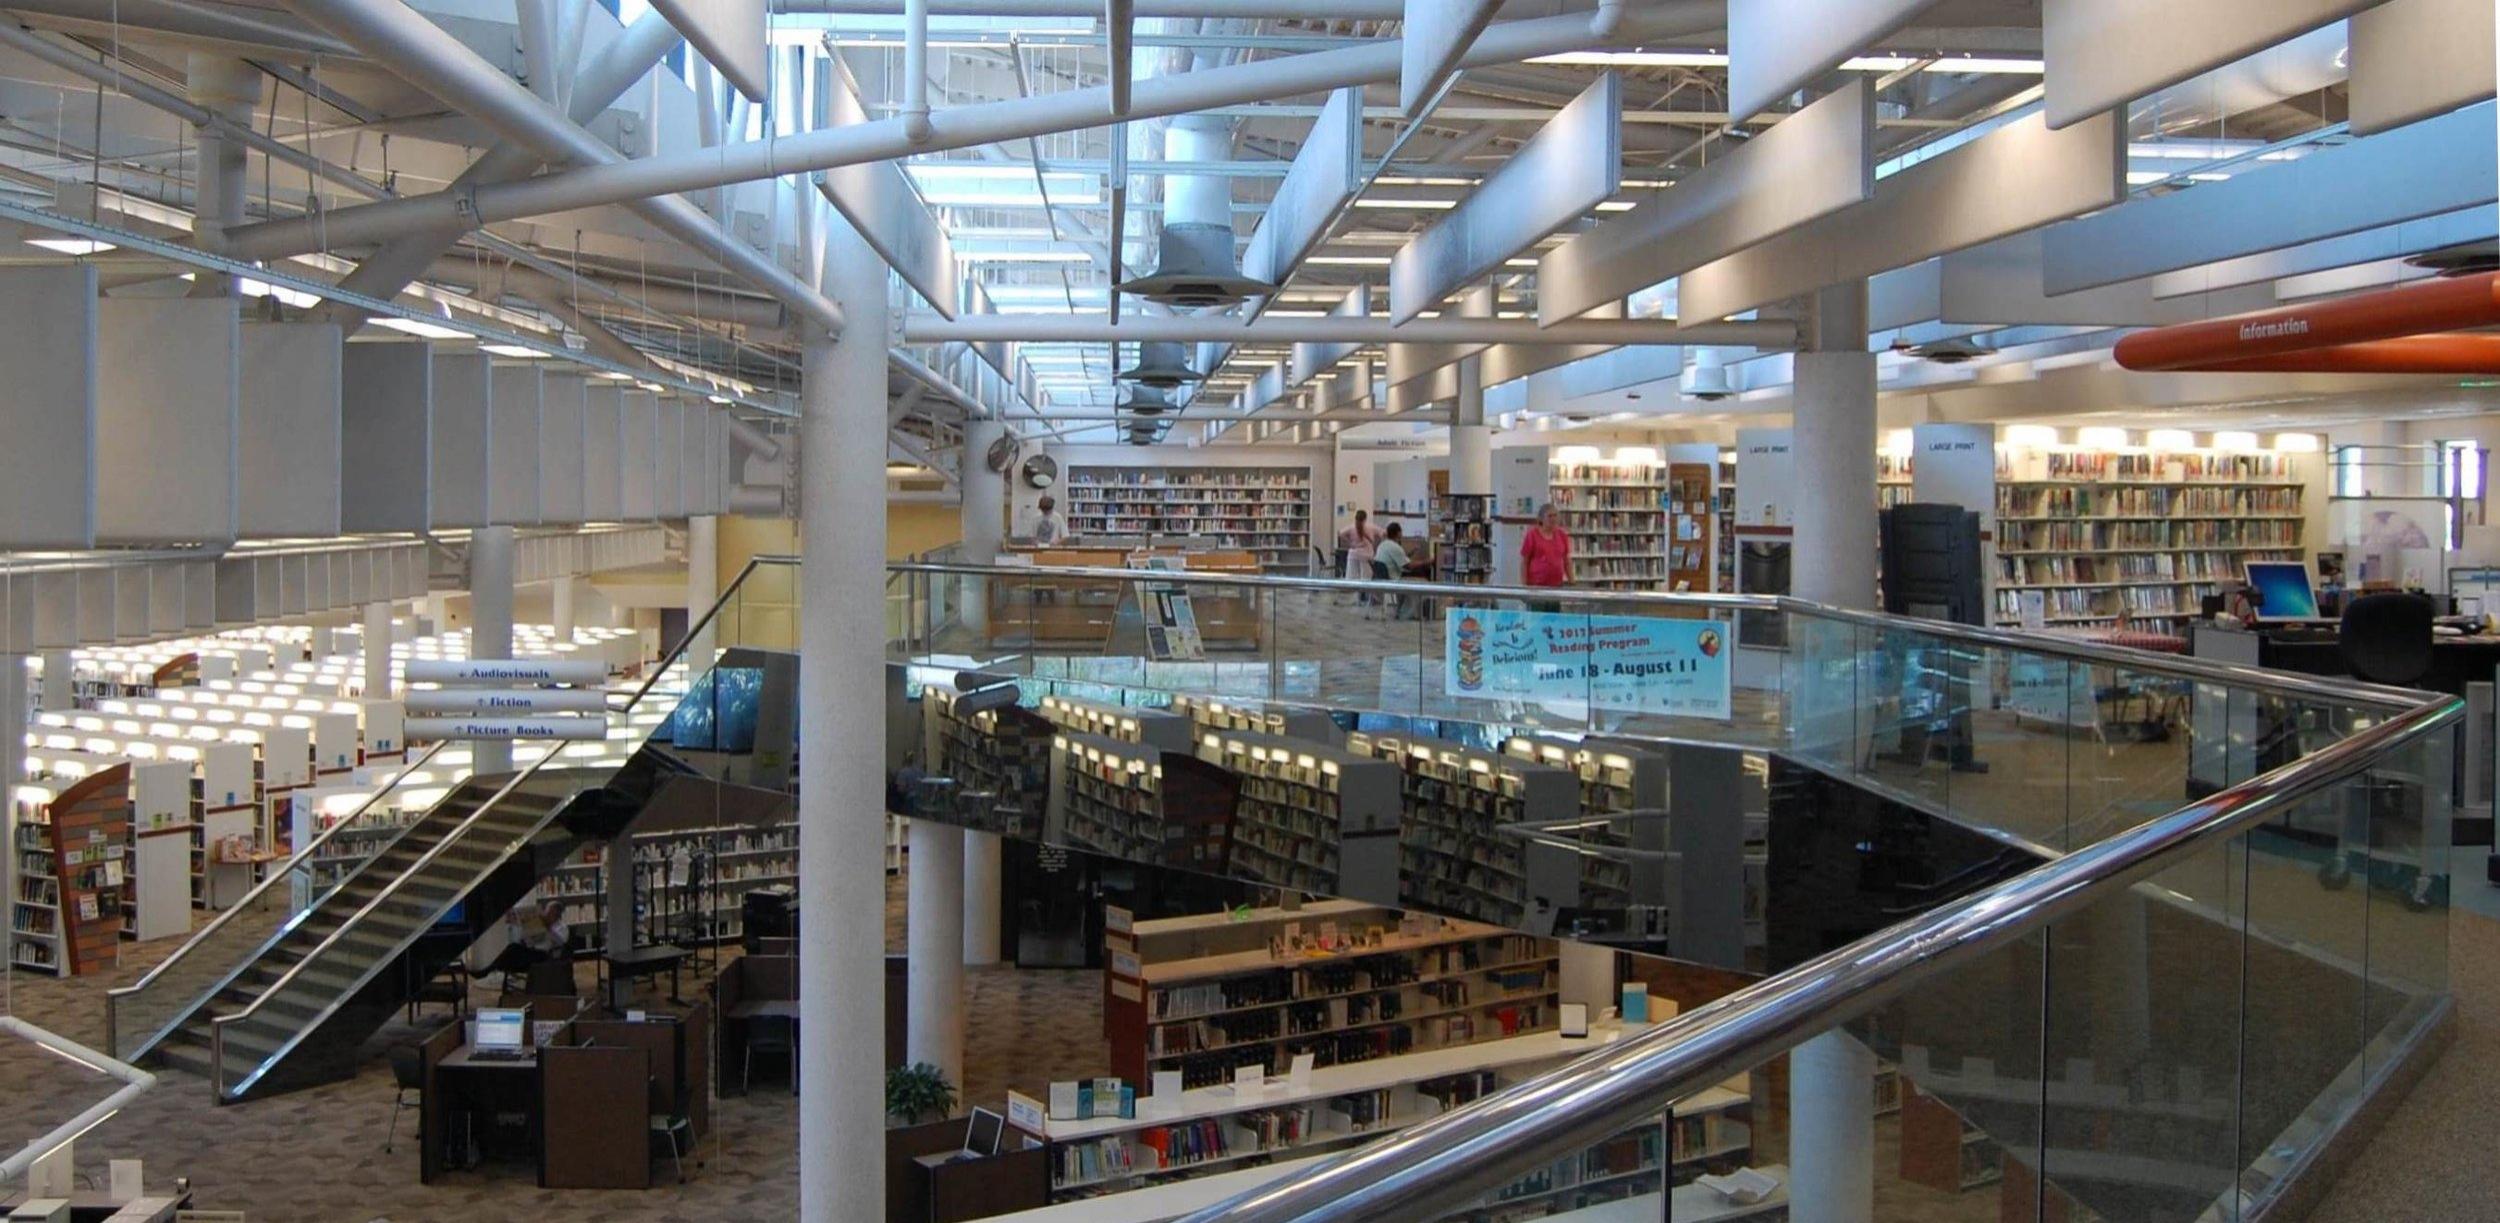 Meyera E. Oberndorf Central Library #library#norfolk#children#technology#information#books